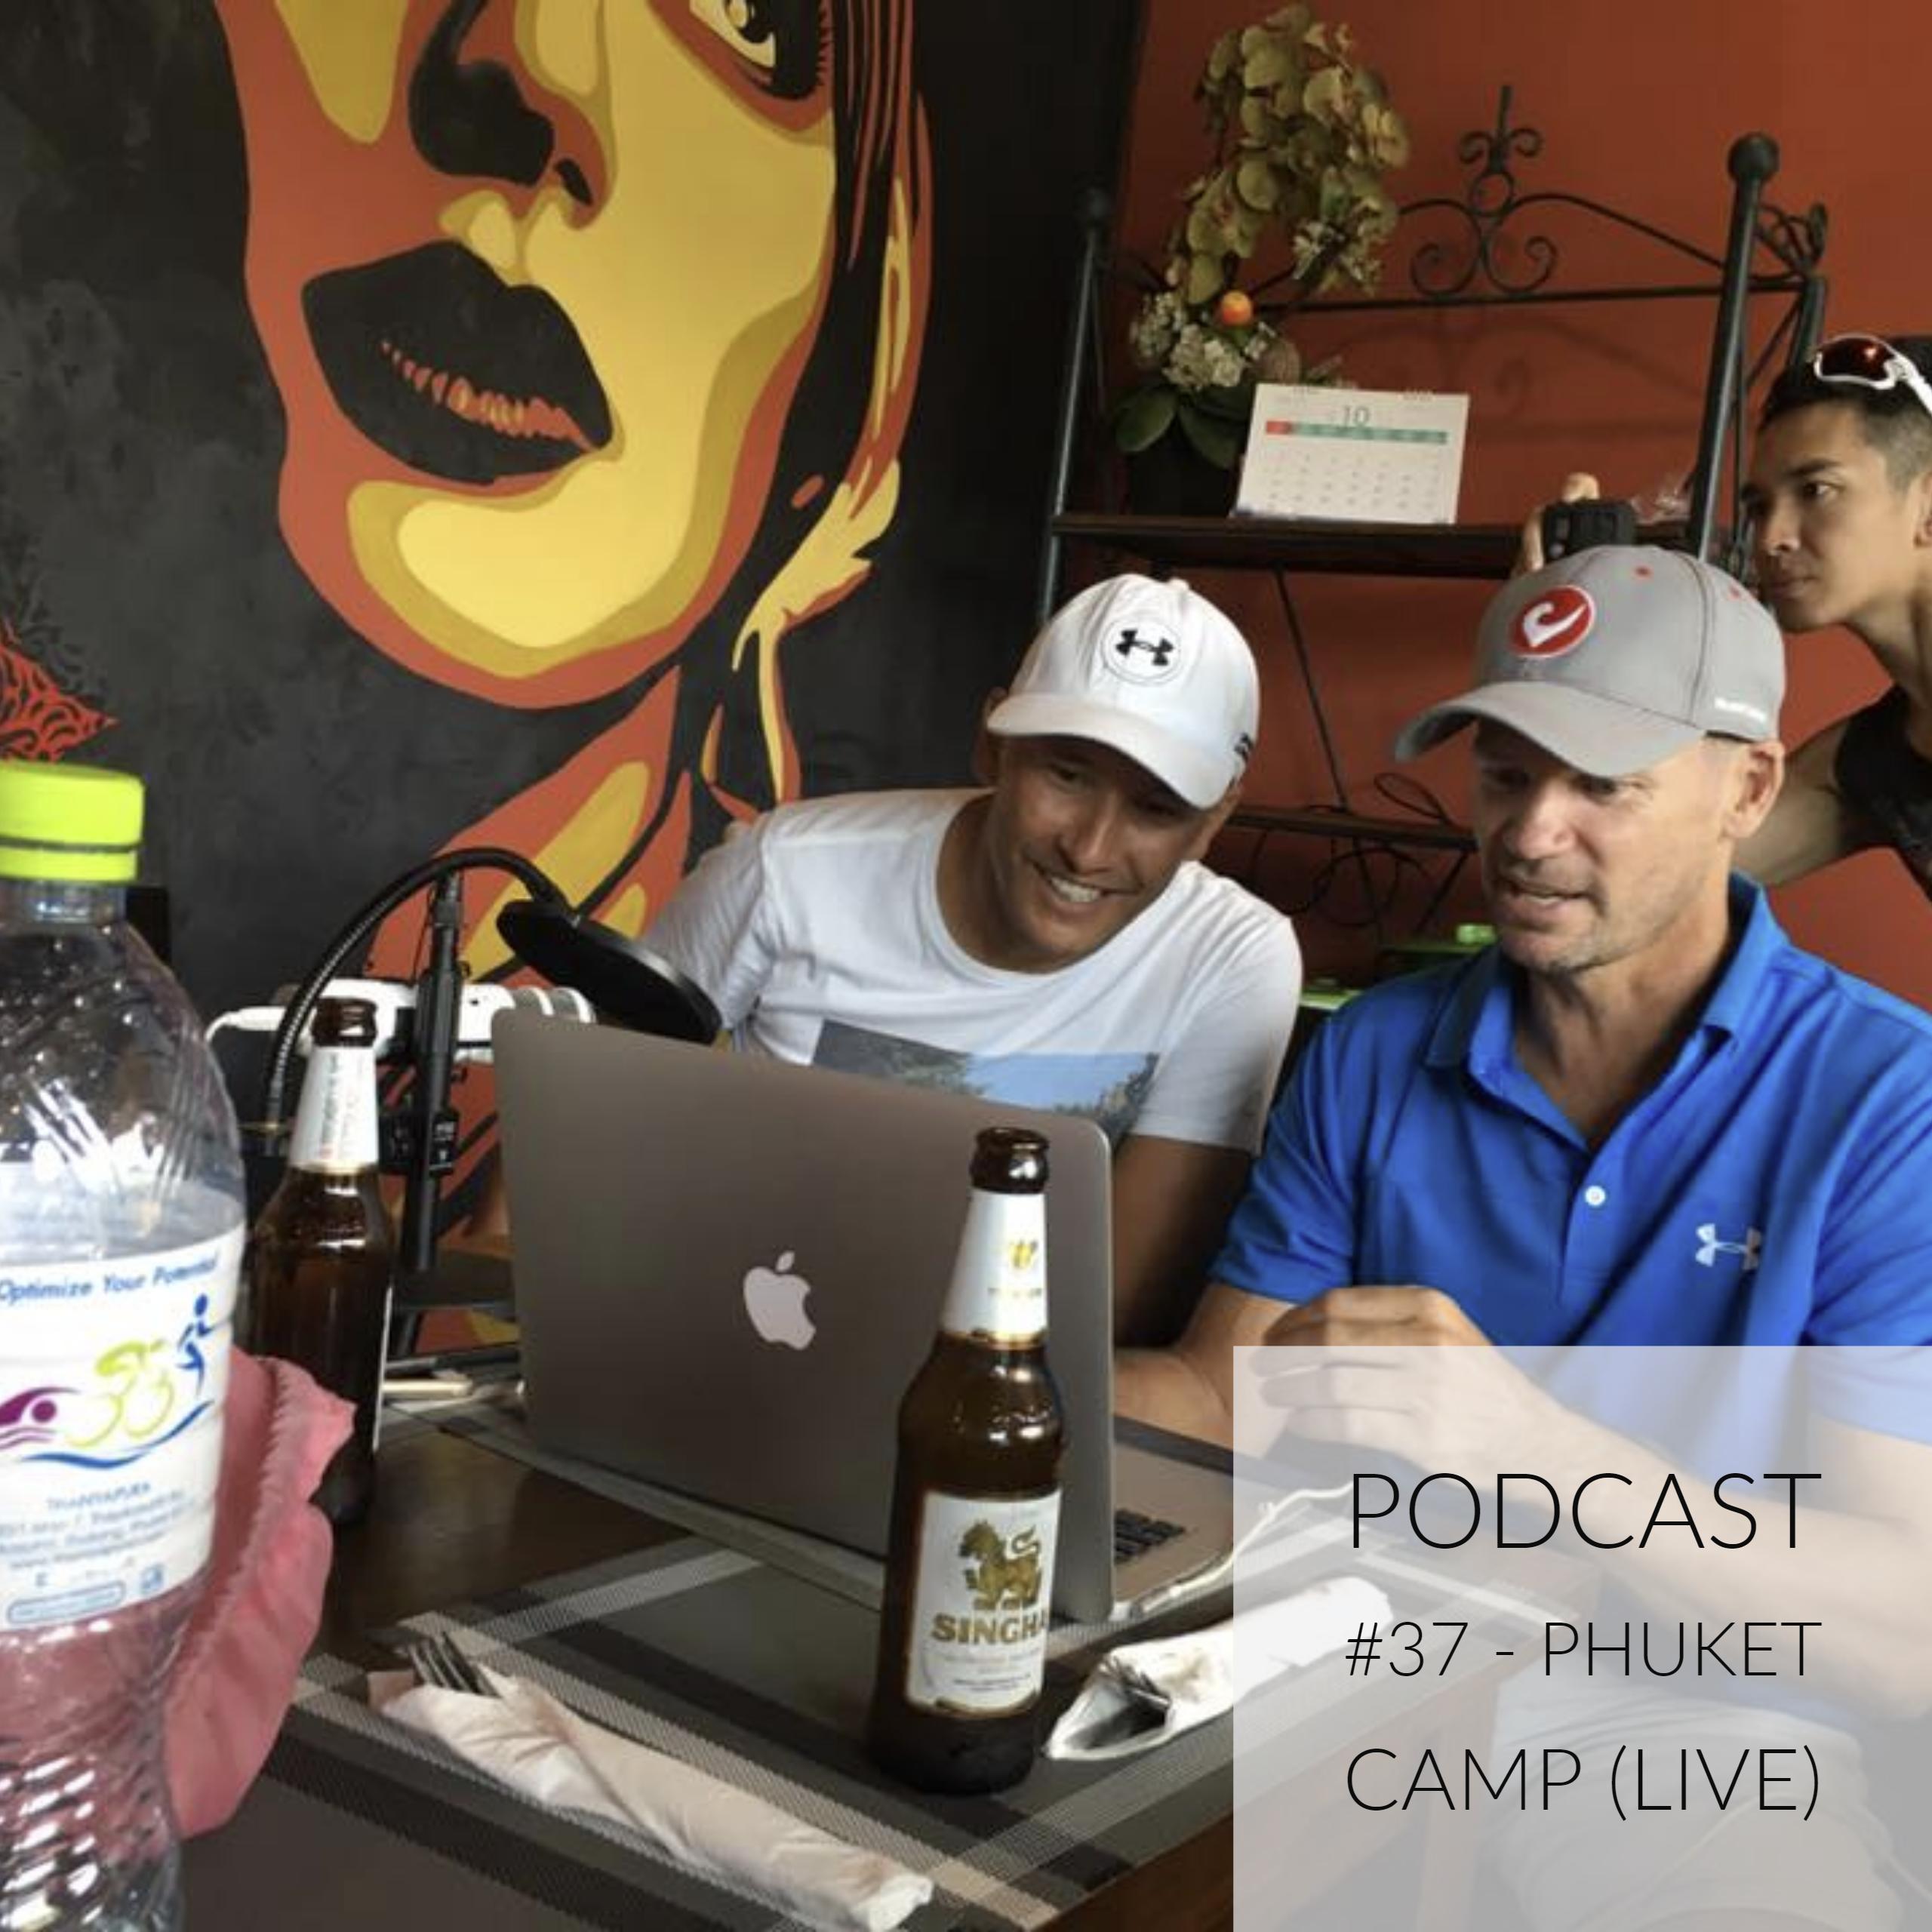 #37 - Phuket Camp ... Lot's of Triathlon Smack Talk ...